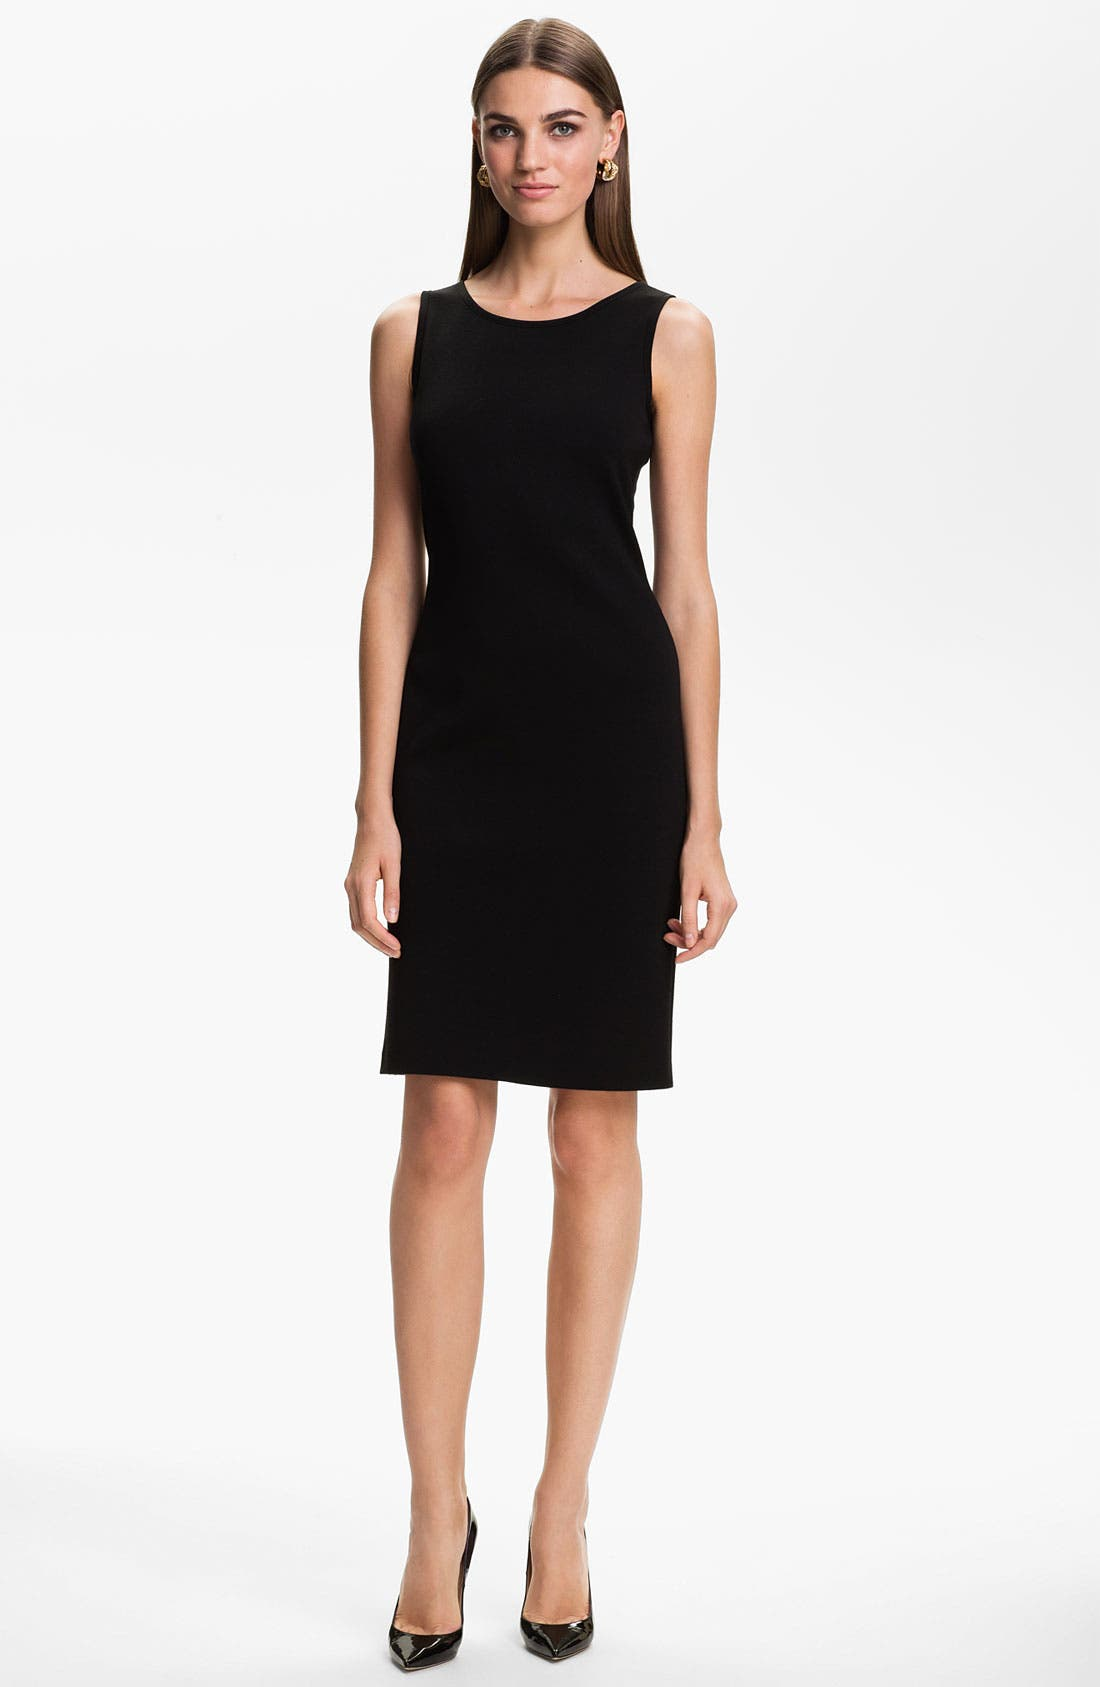 Alternate Image 1 Selected - St. John Collection Milano Knit Sheath Dress